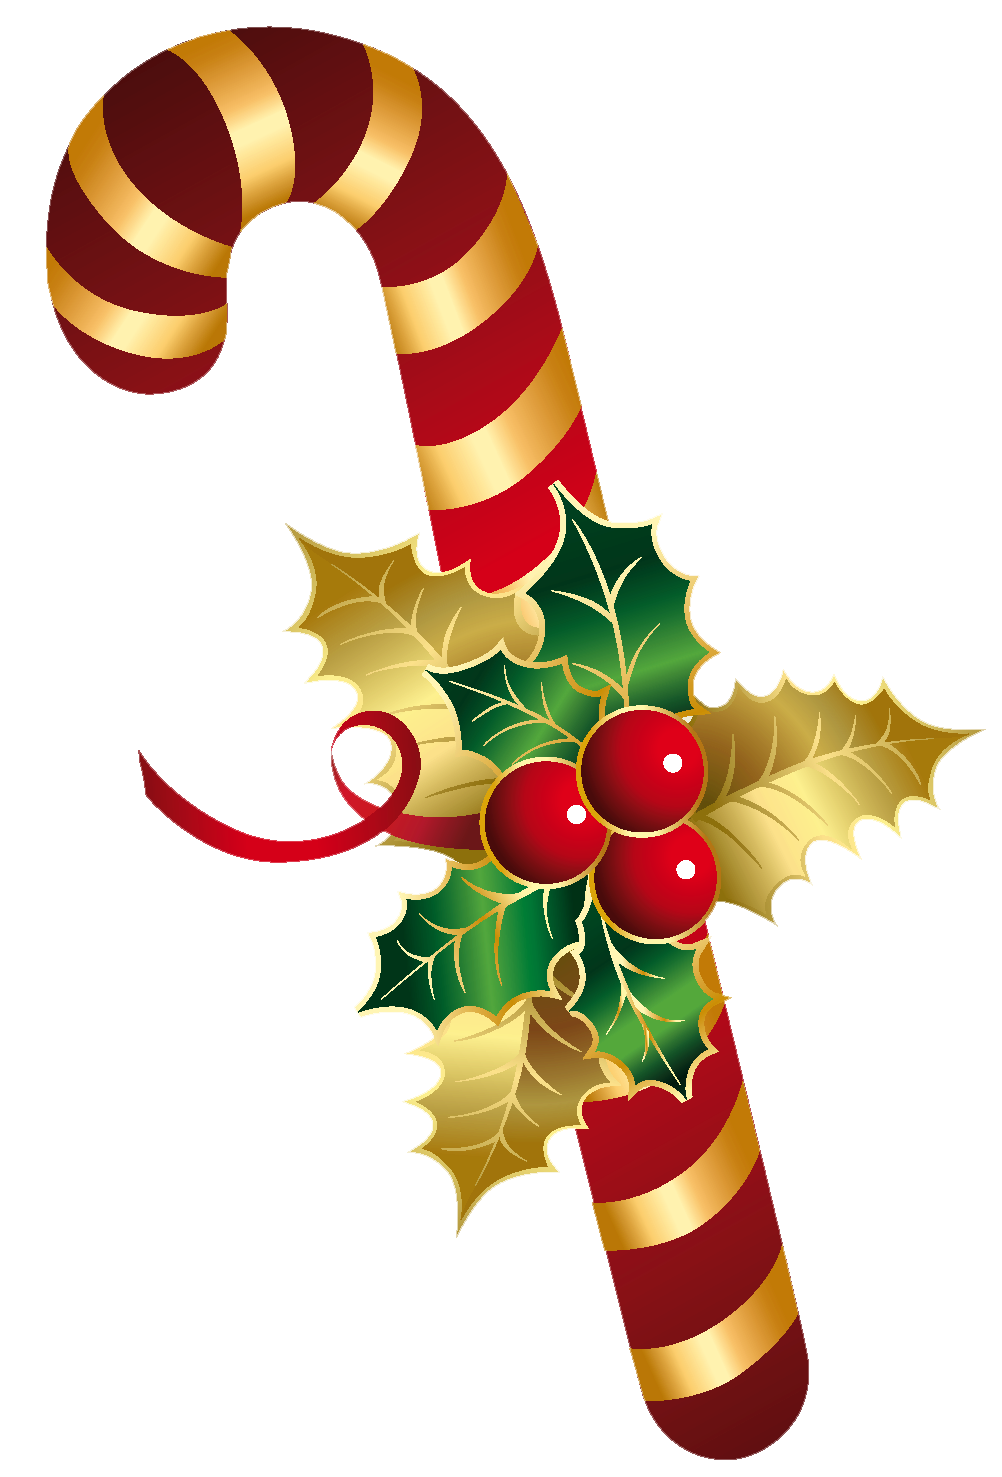 Christmas Candy PNG Image Pintura de natal, Molduras